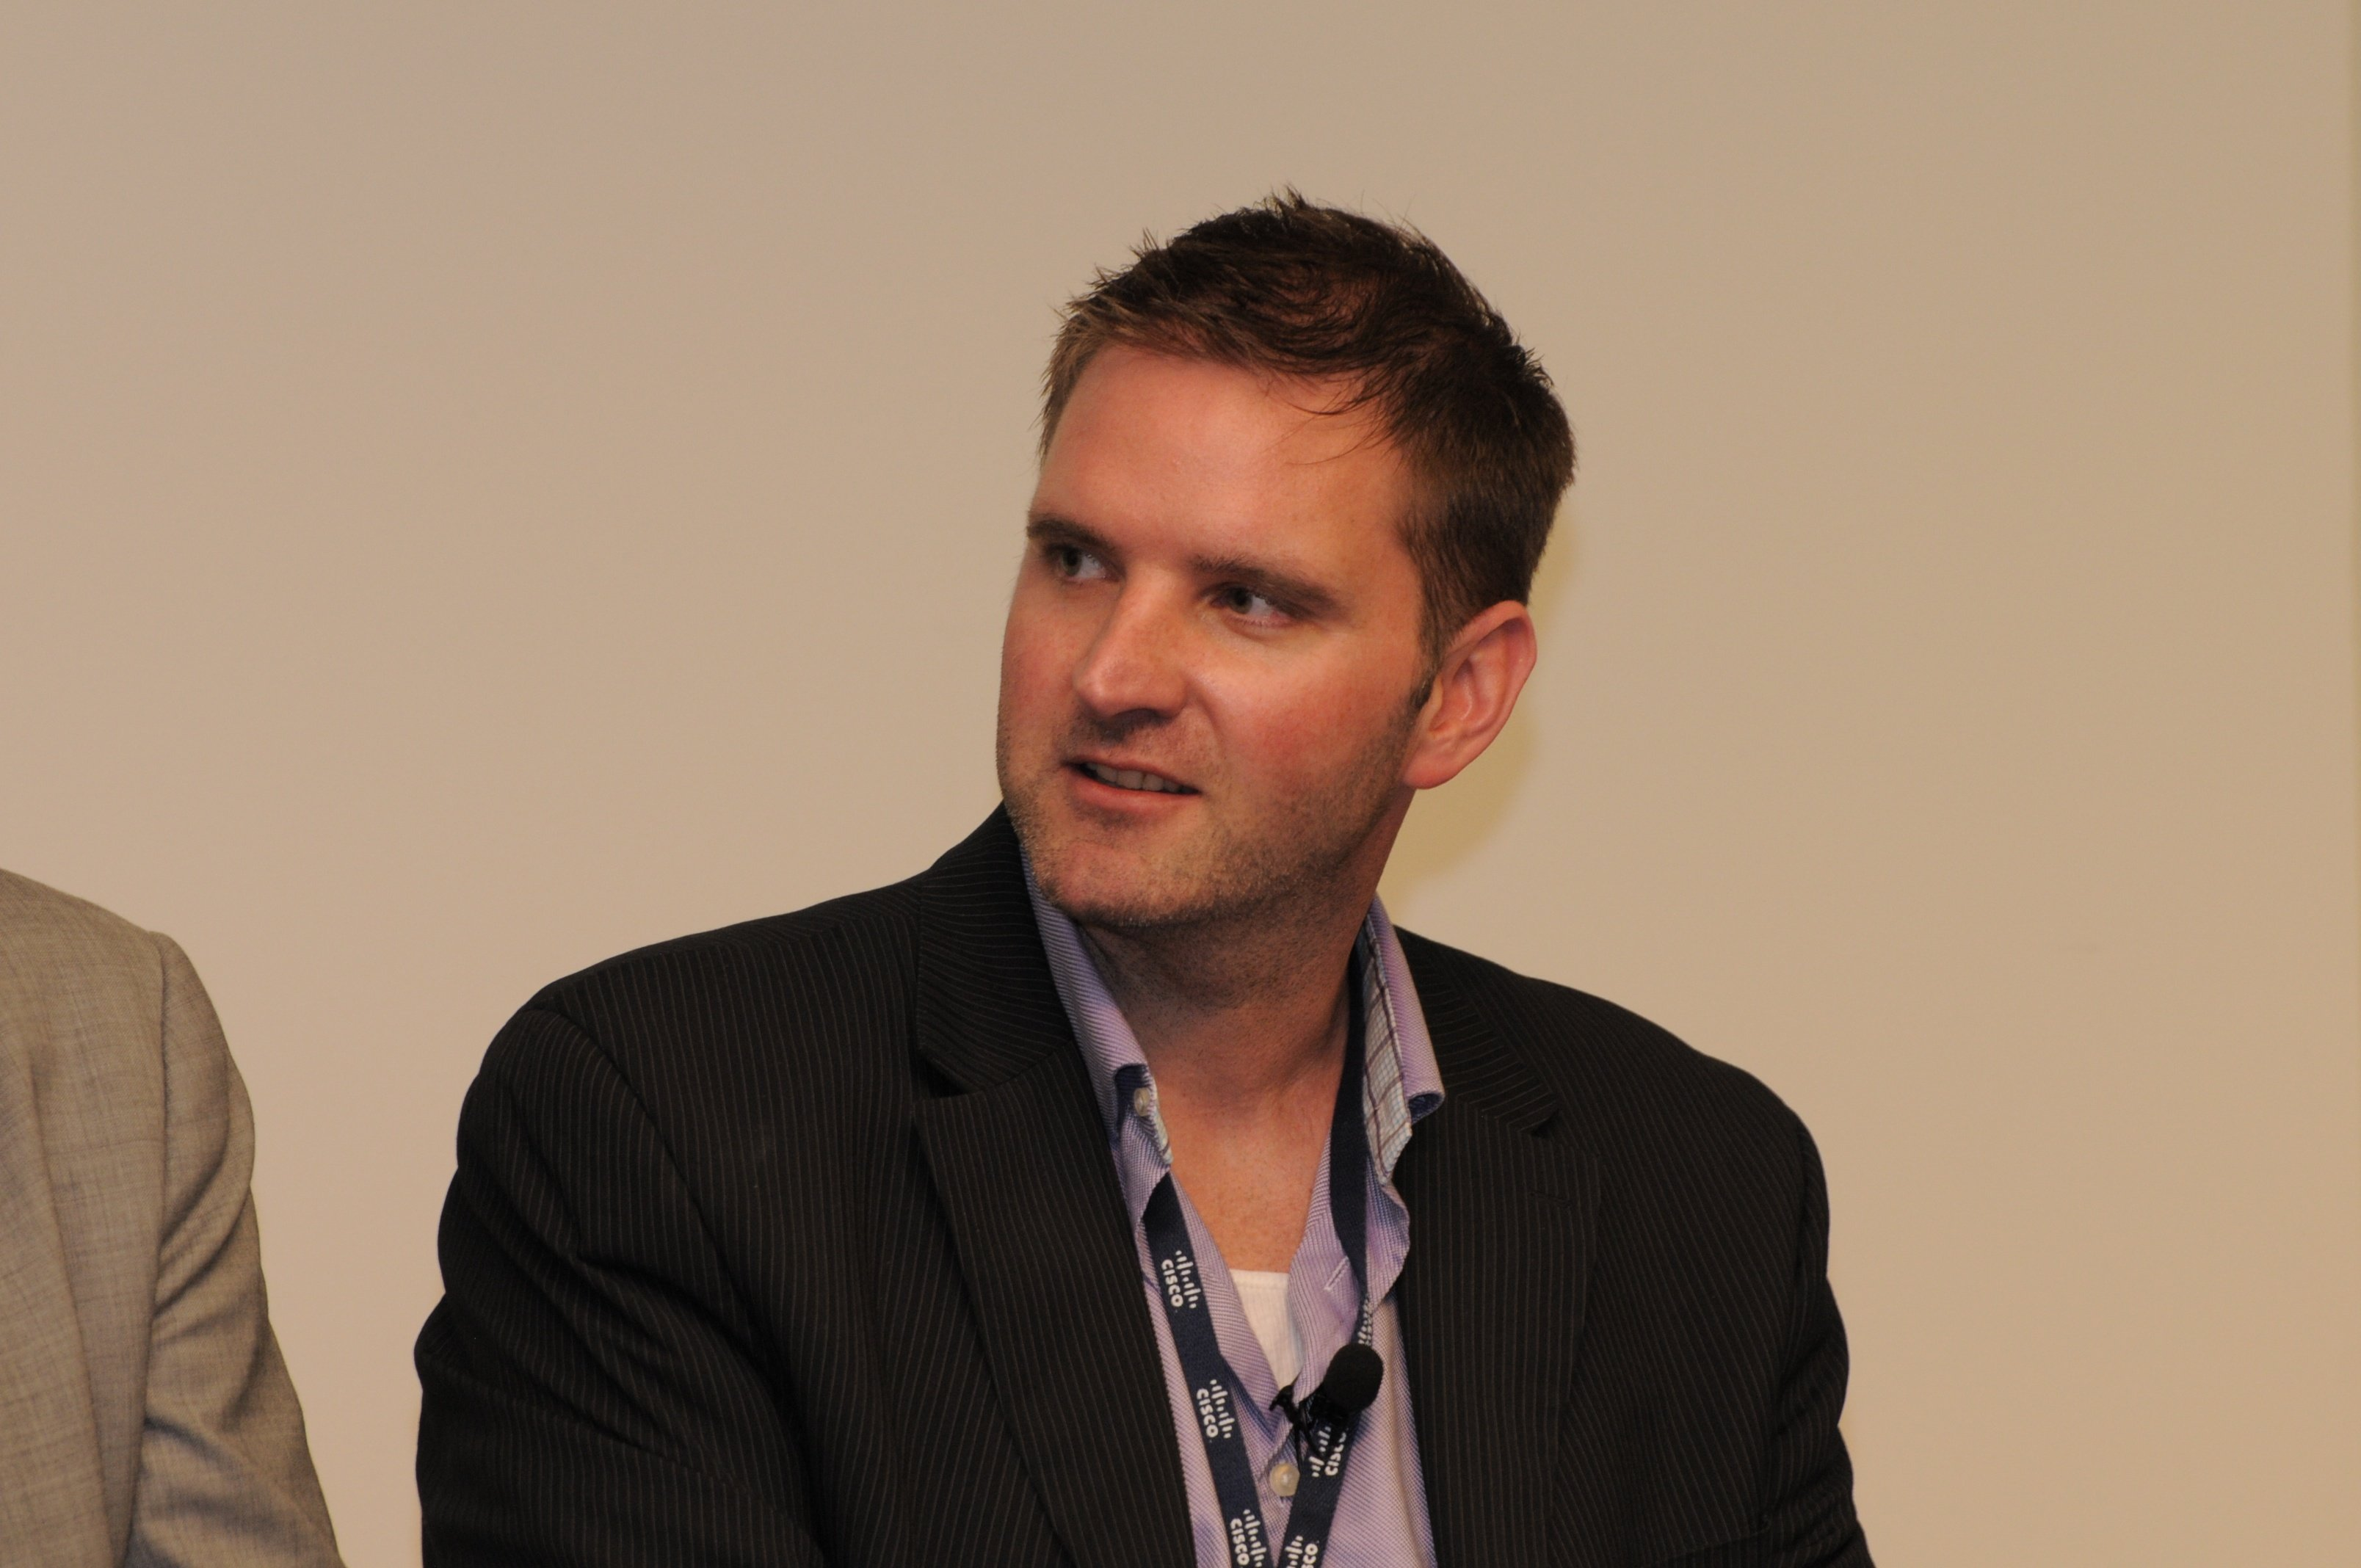 SDN in University Environments panelist Brent Salisbury, University of Kentucky